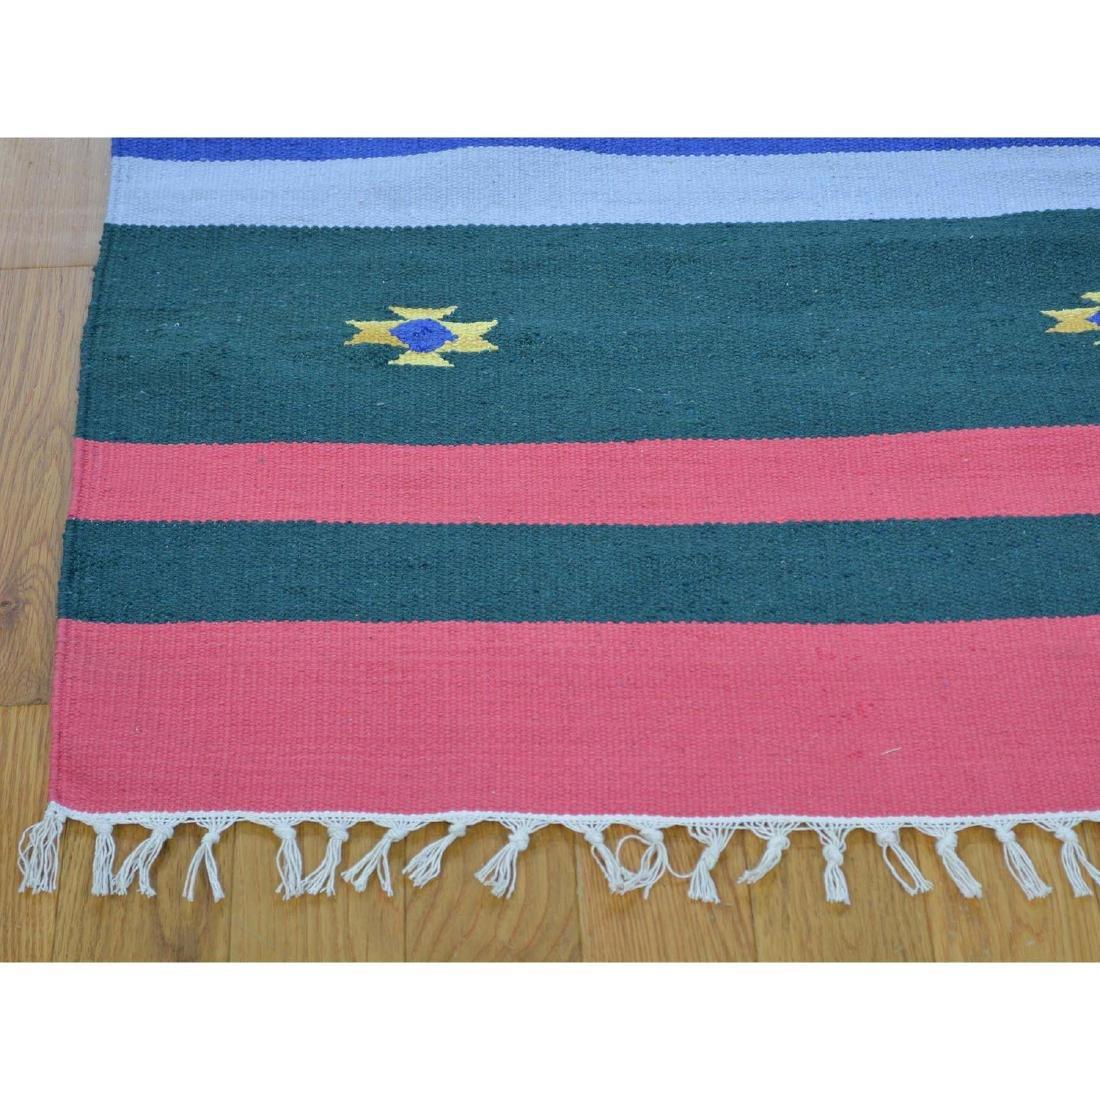 Navajo Design Runner Flat Weave Kilim Hand Woven Rug - 3